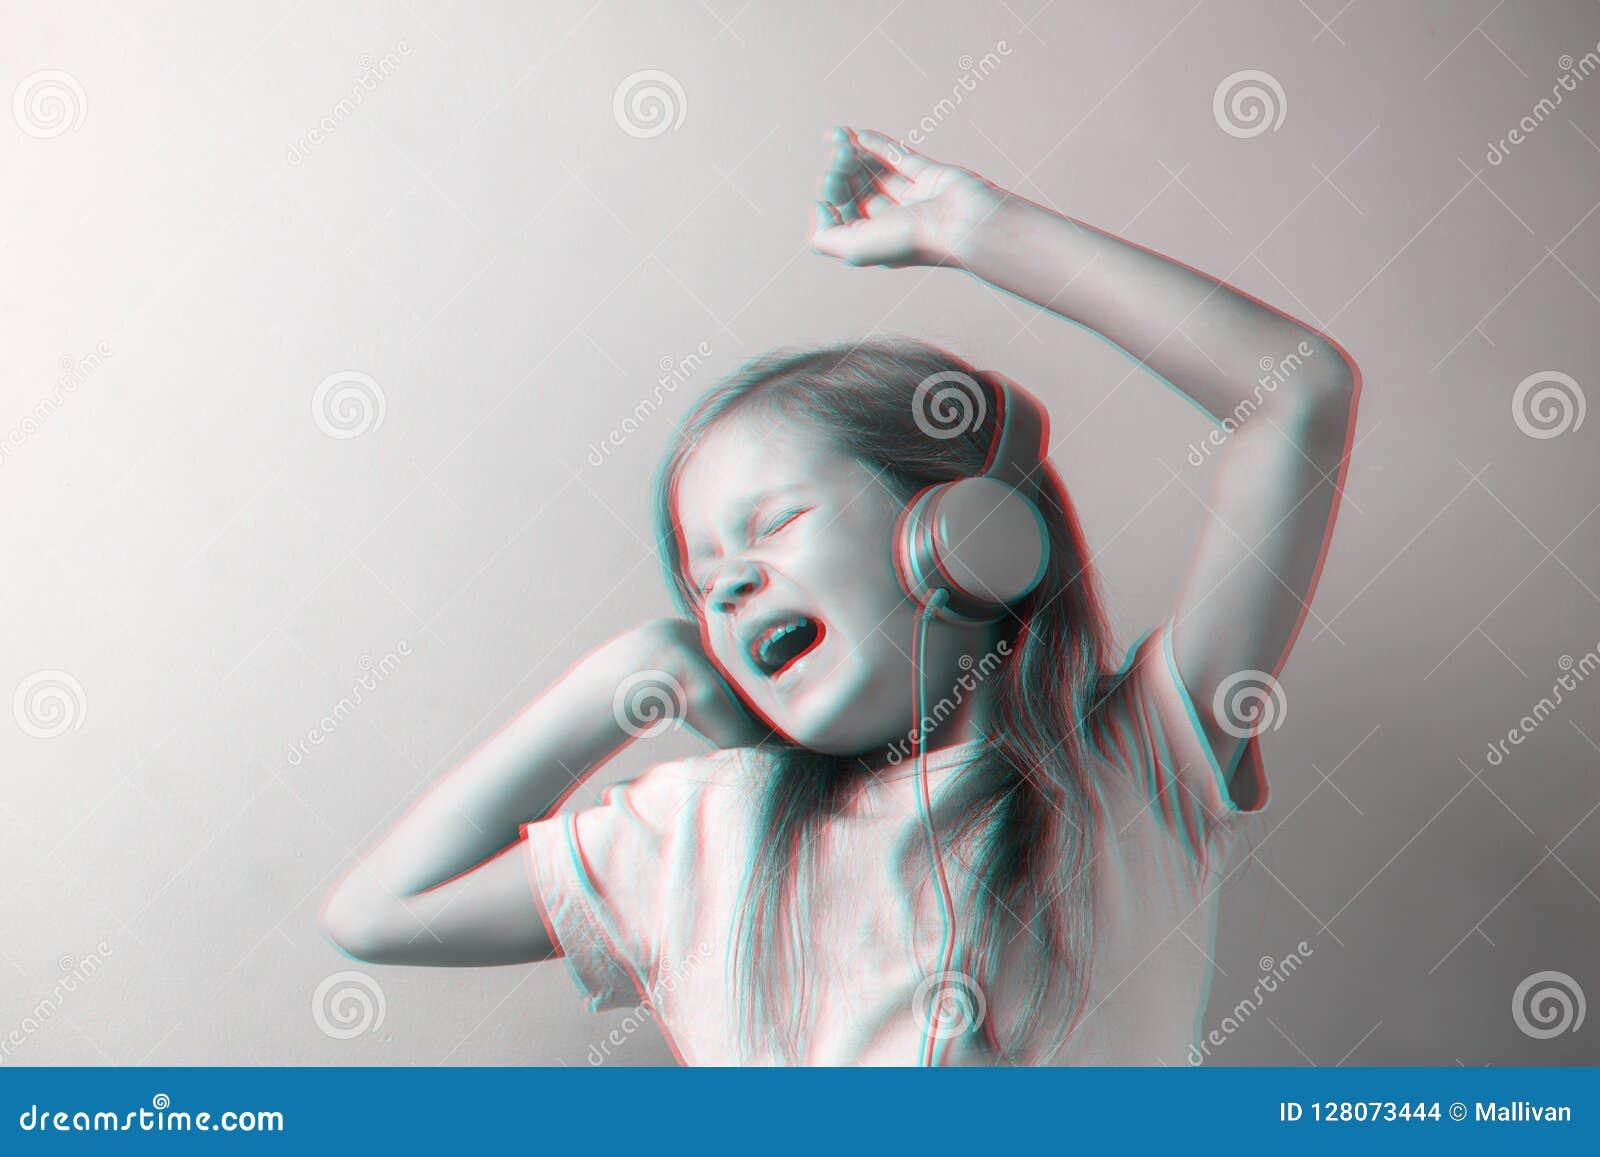 Girl singing in headphones, 3D anaglyph effect